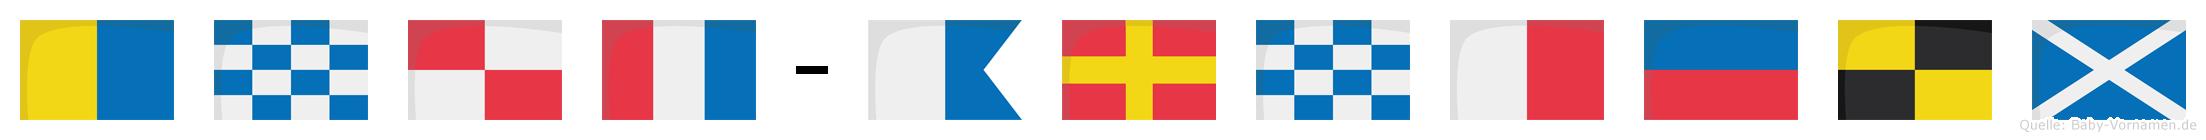 Knut-Arnhelm im Flaggenalphabet